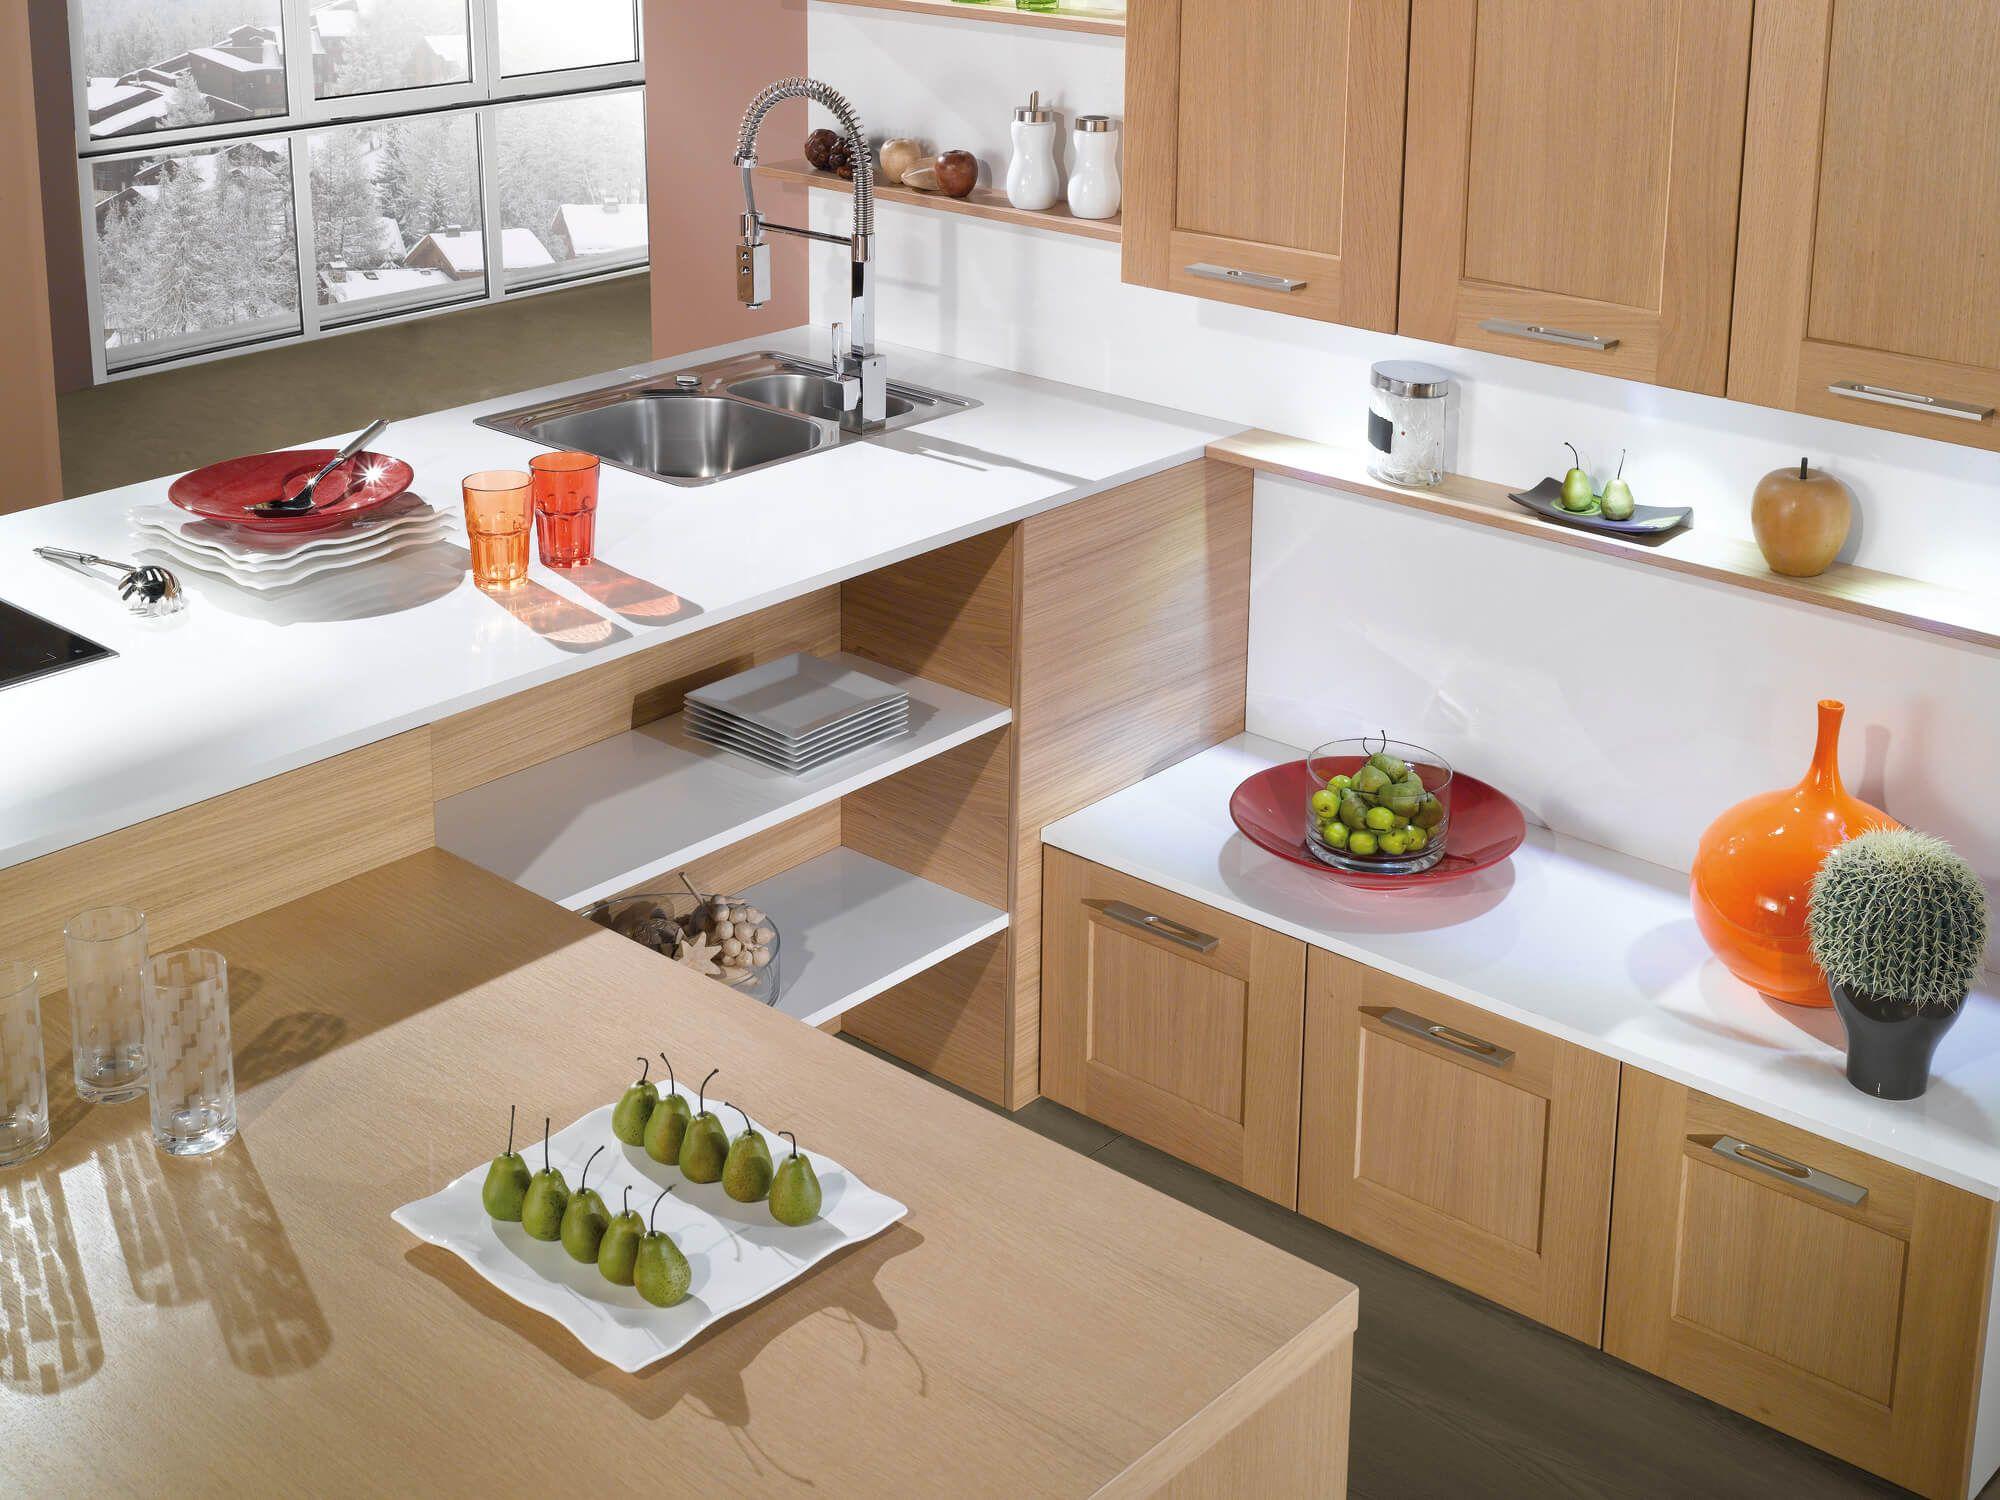 Pyram oak for the kitchen, creates a modern